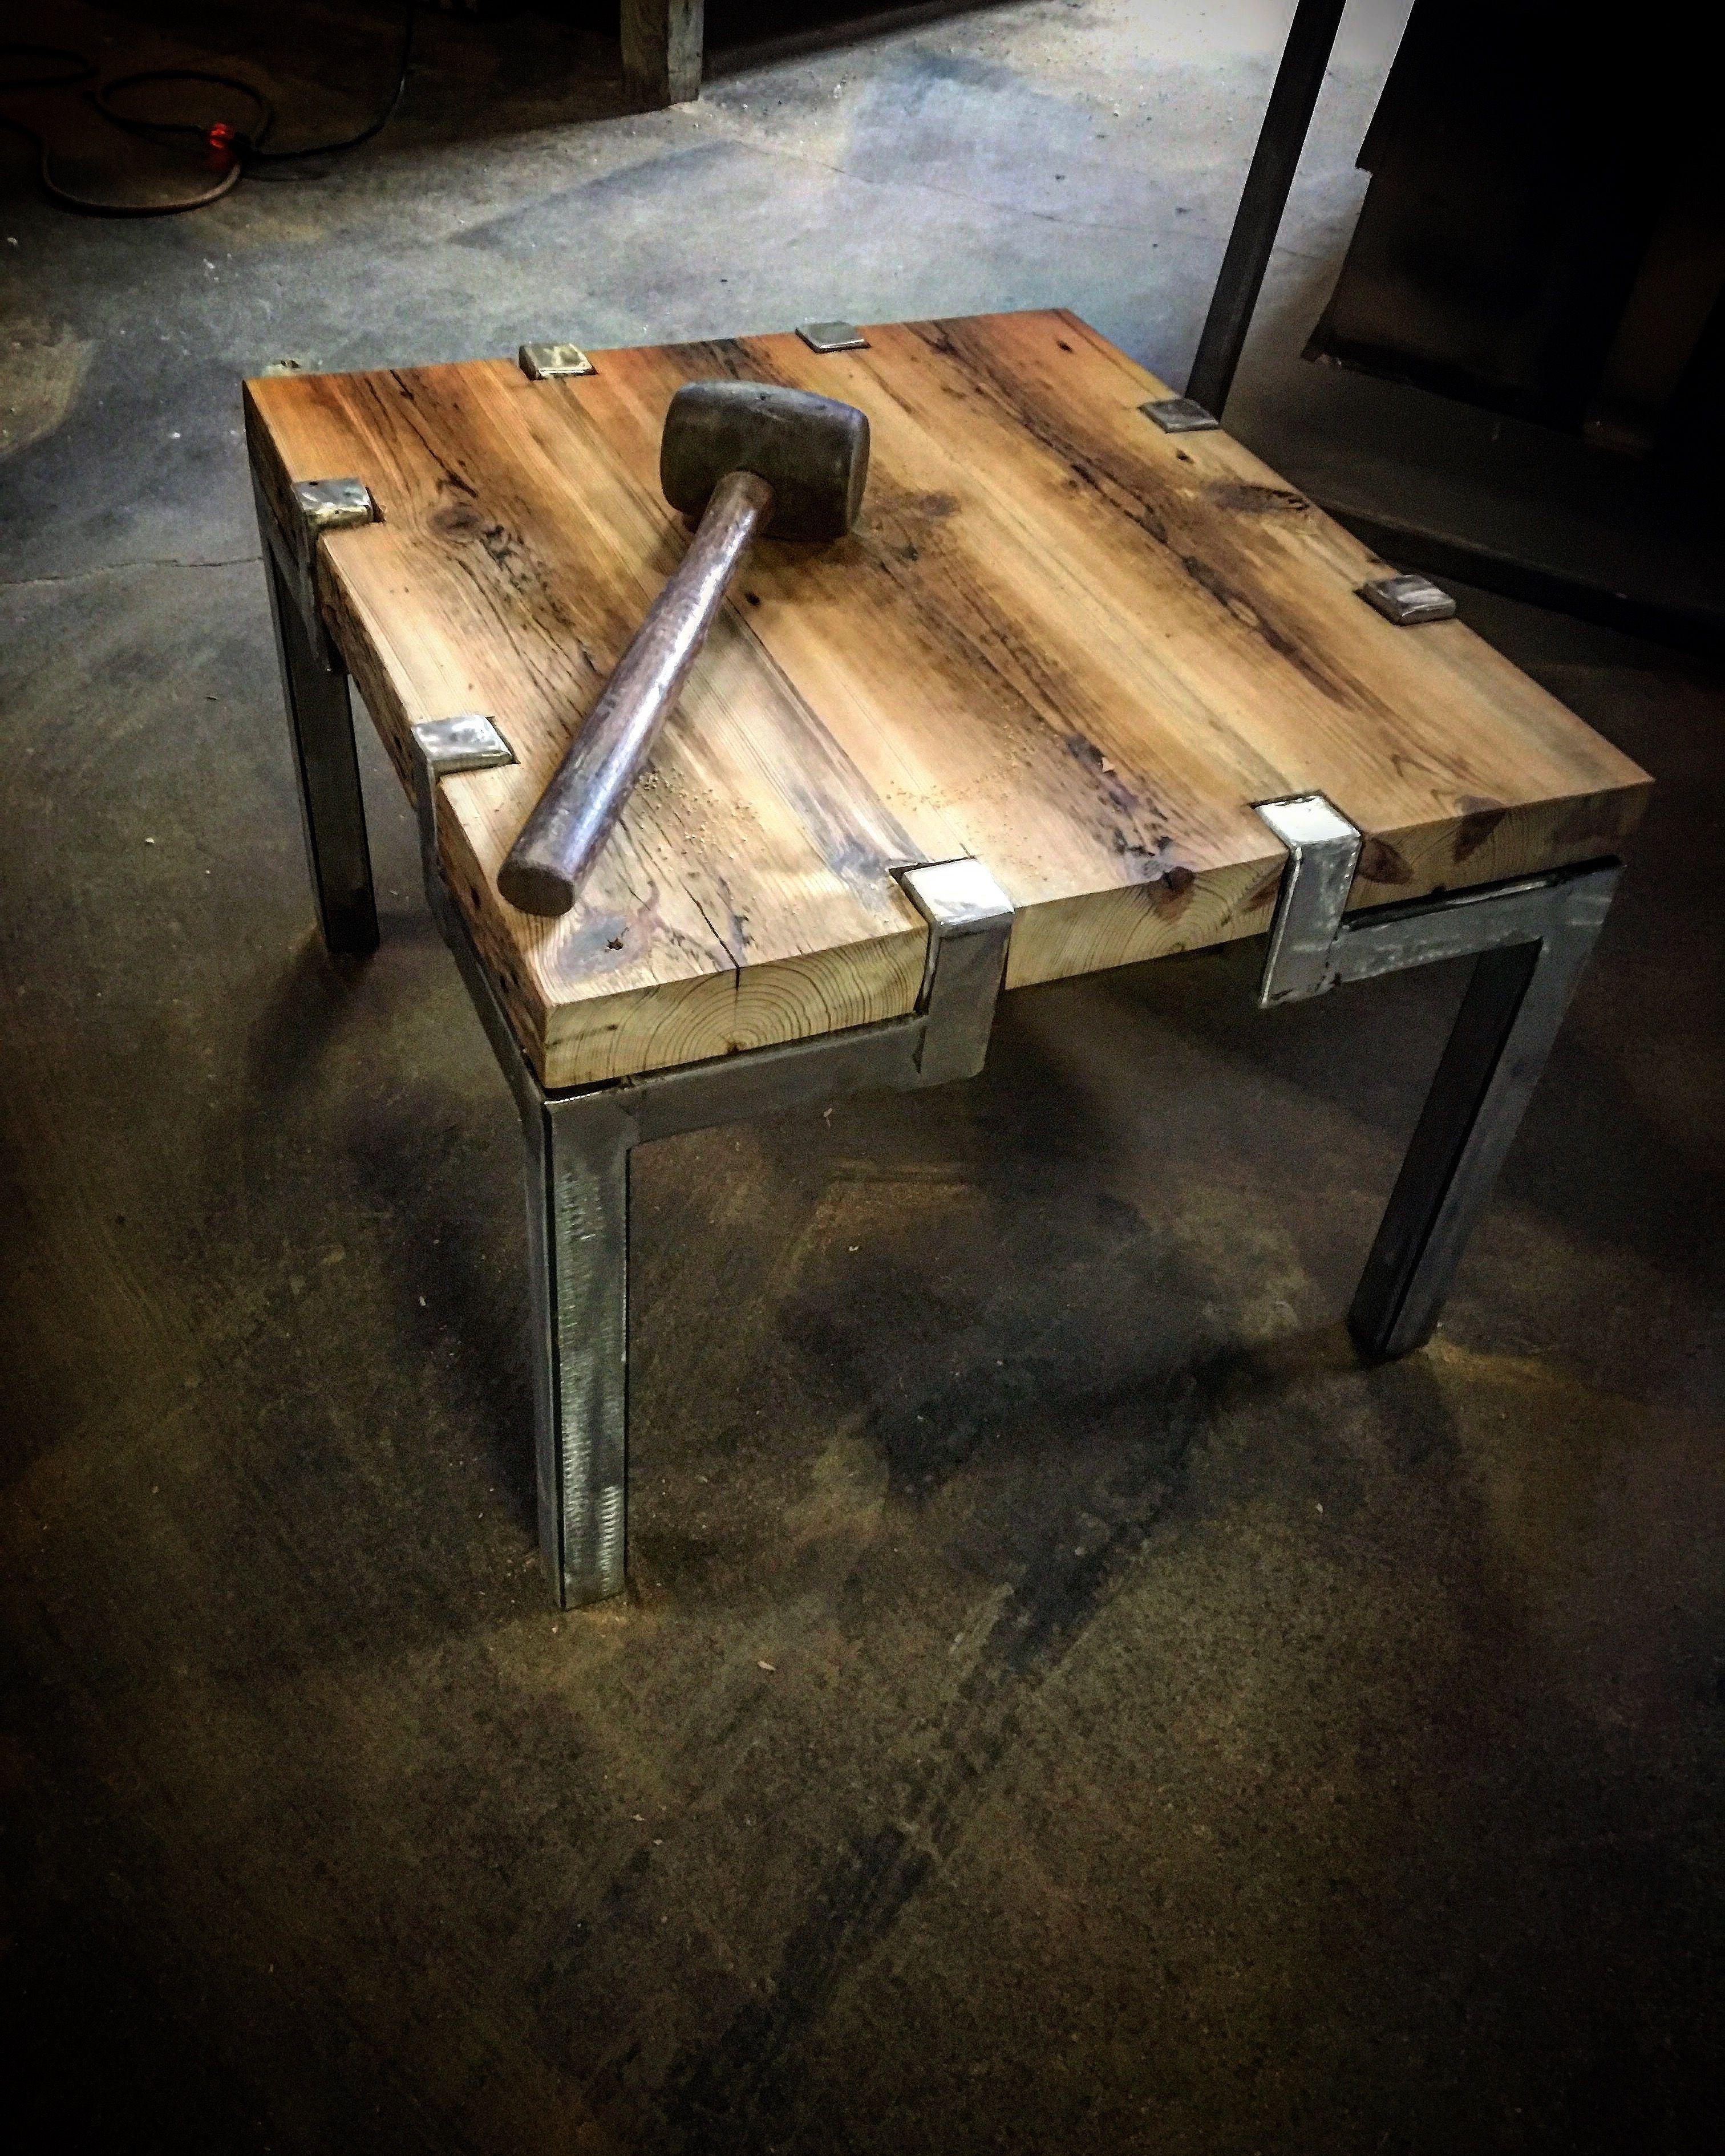 b8724cee780afdc3c05a23d2c0a1b44e Top Result 50 Lovely Redwood Coffee Table Photos 2017 Hgd6